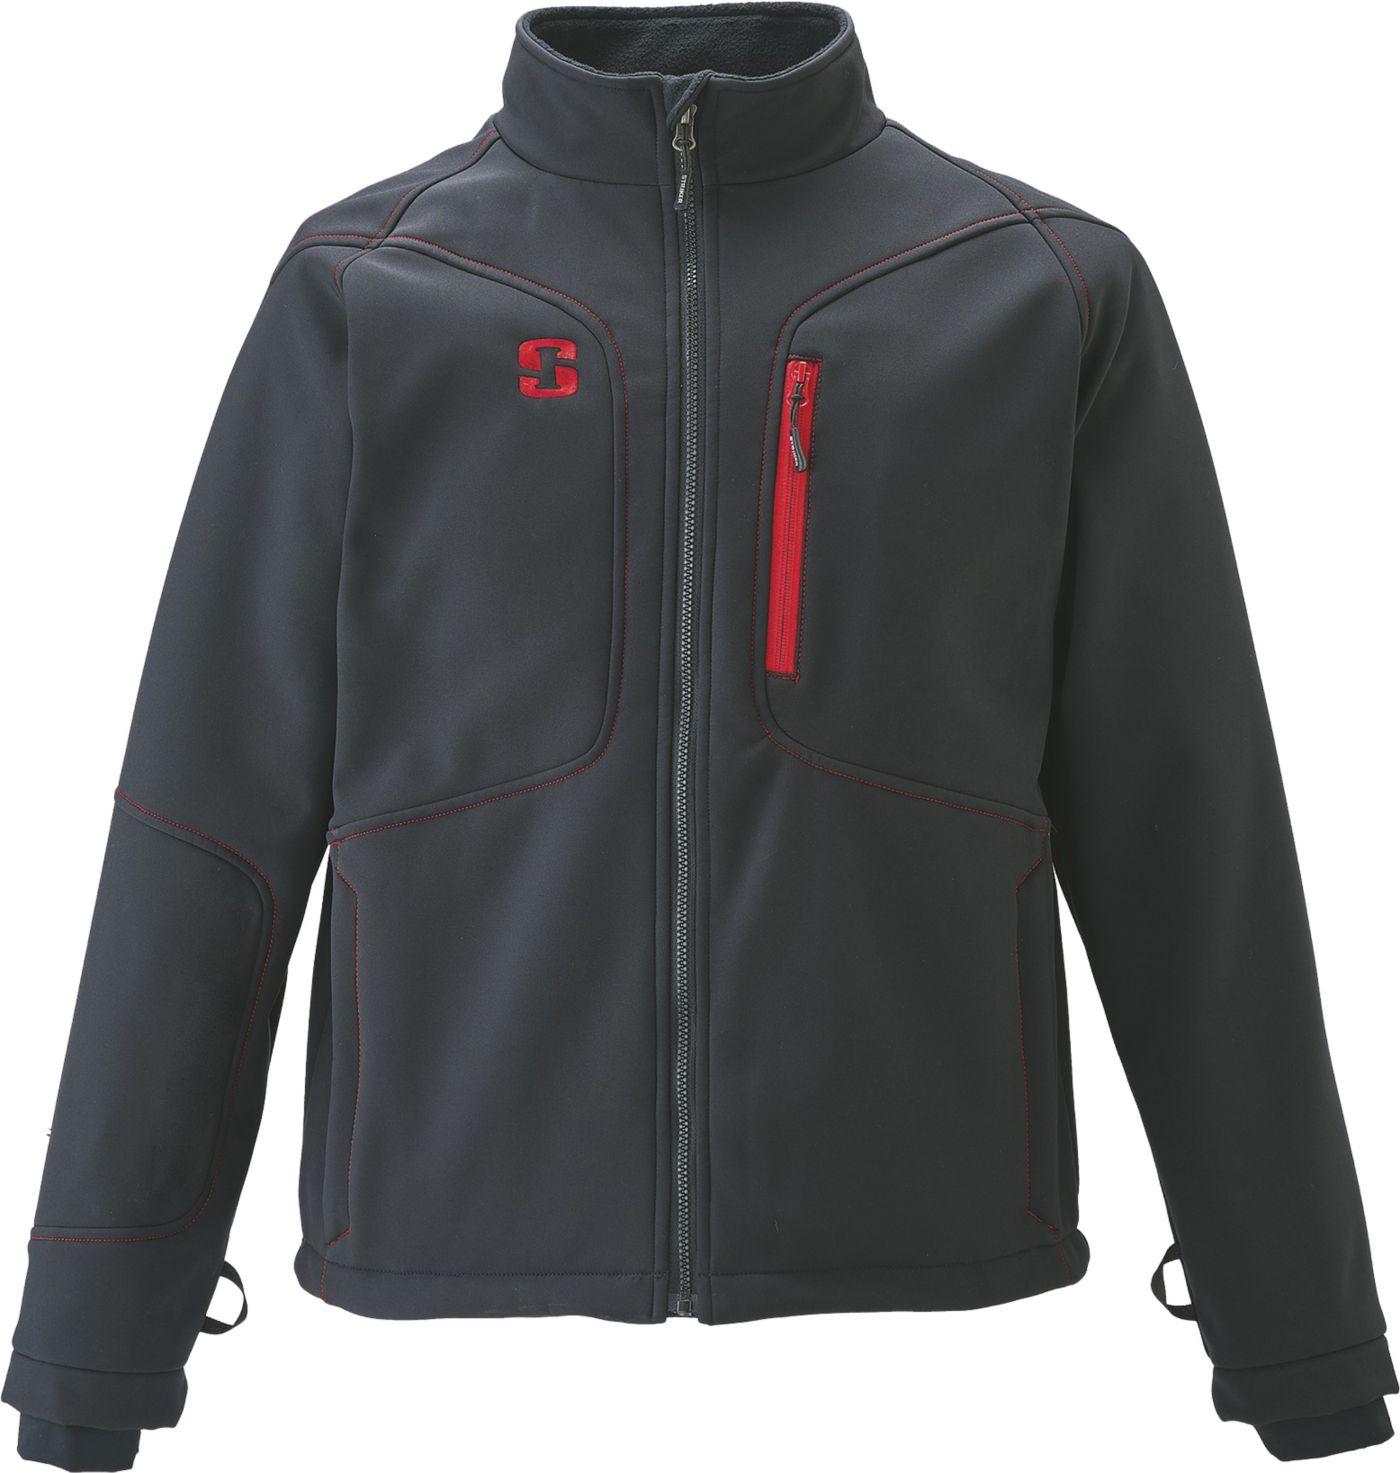 Striker Men's Climate G2 Softshell Jacket (Regular and Big & Tall)